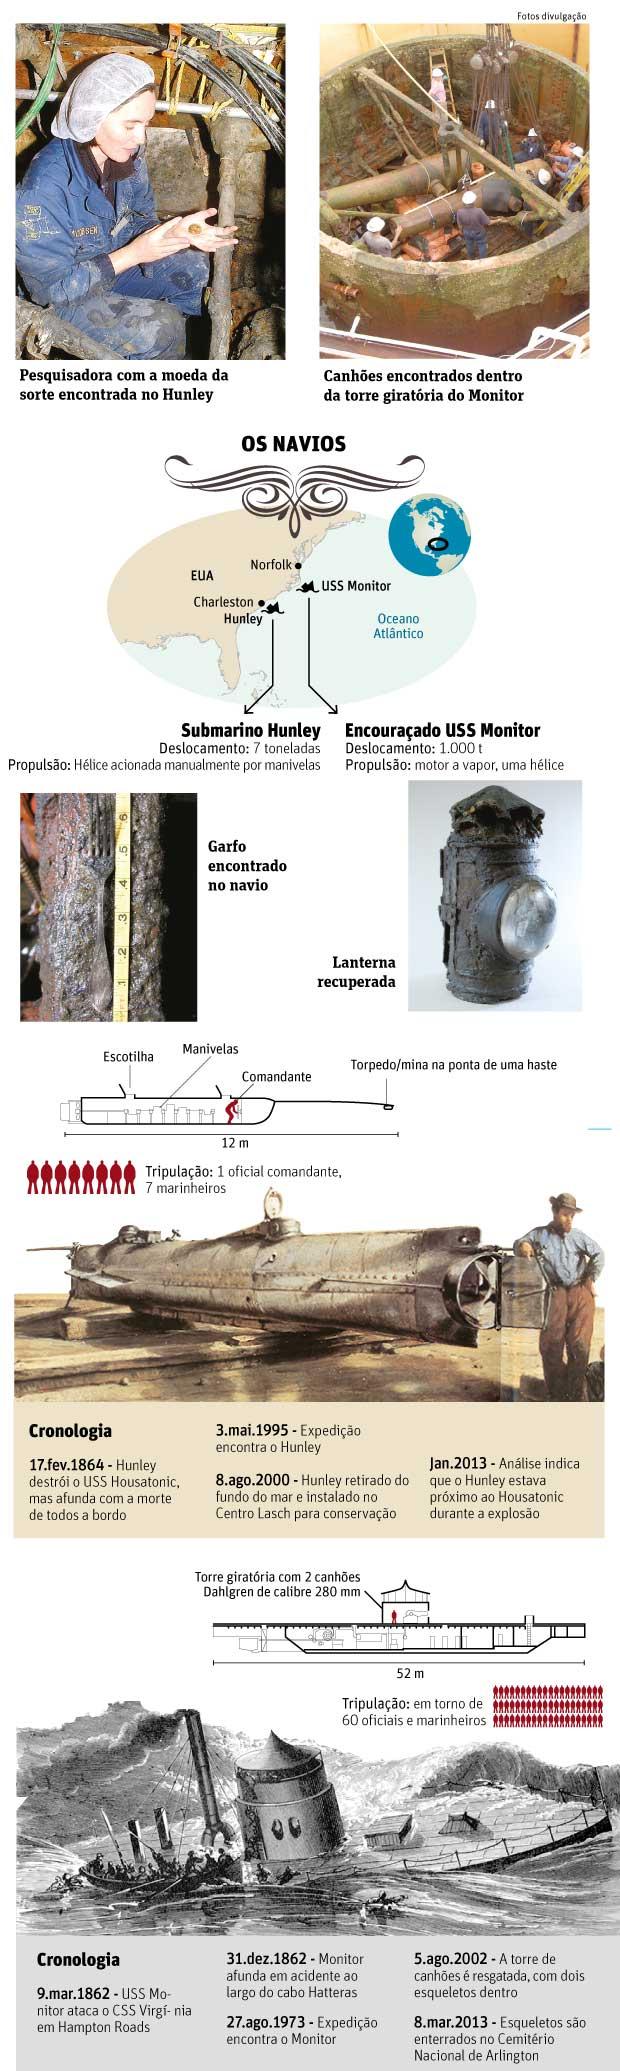 Navio e submarino da Guerra Civil Americana, Fotos de navio e submarino da guerra civil americana resgatados e estudados.